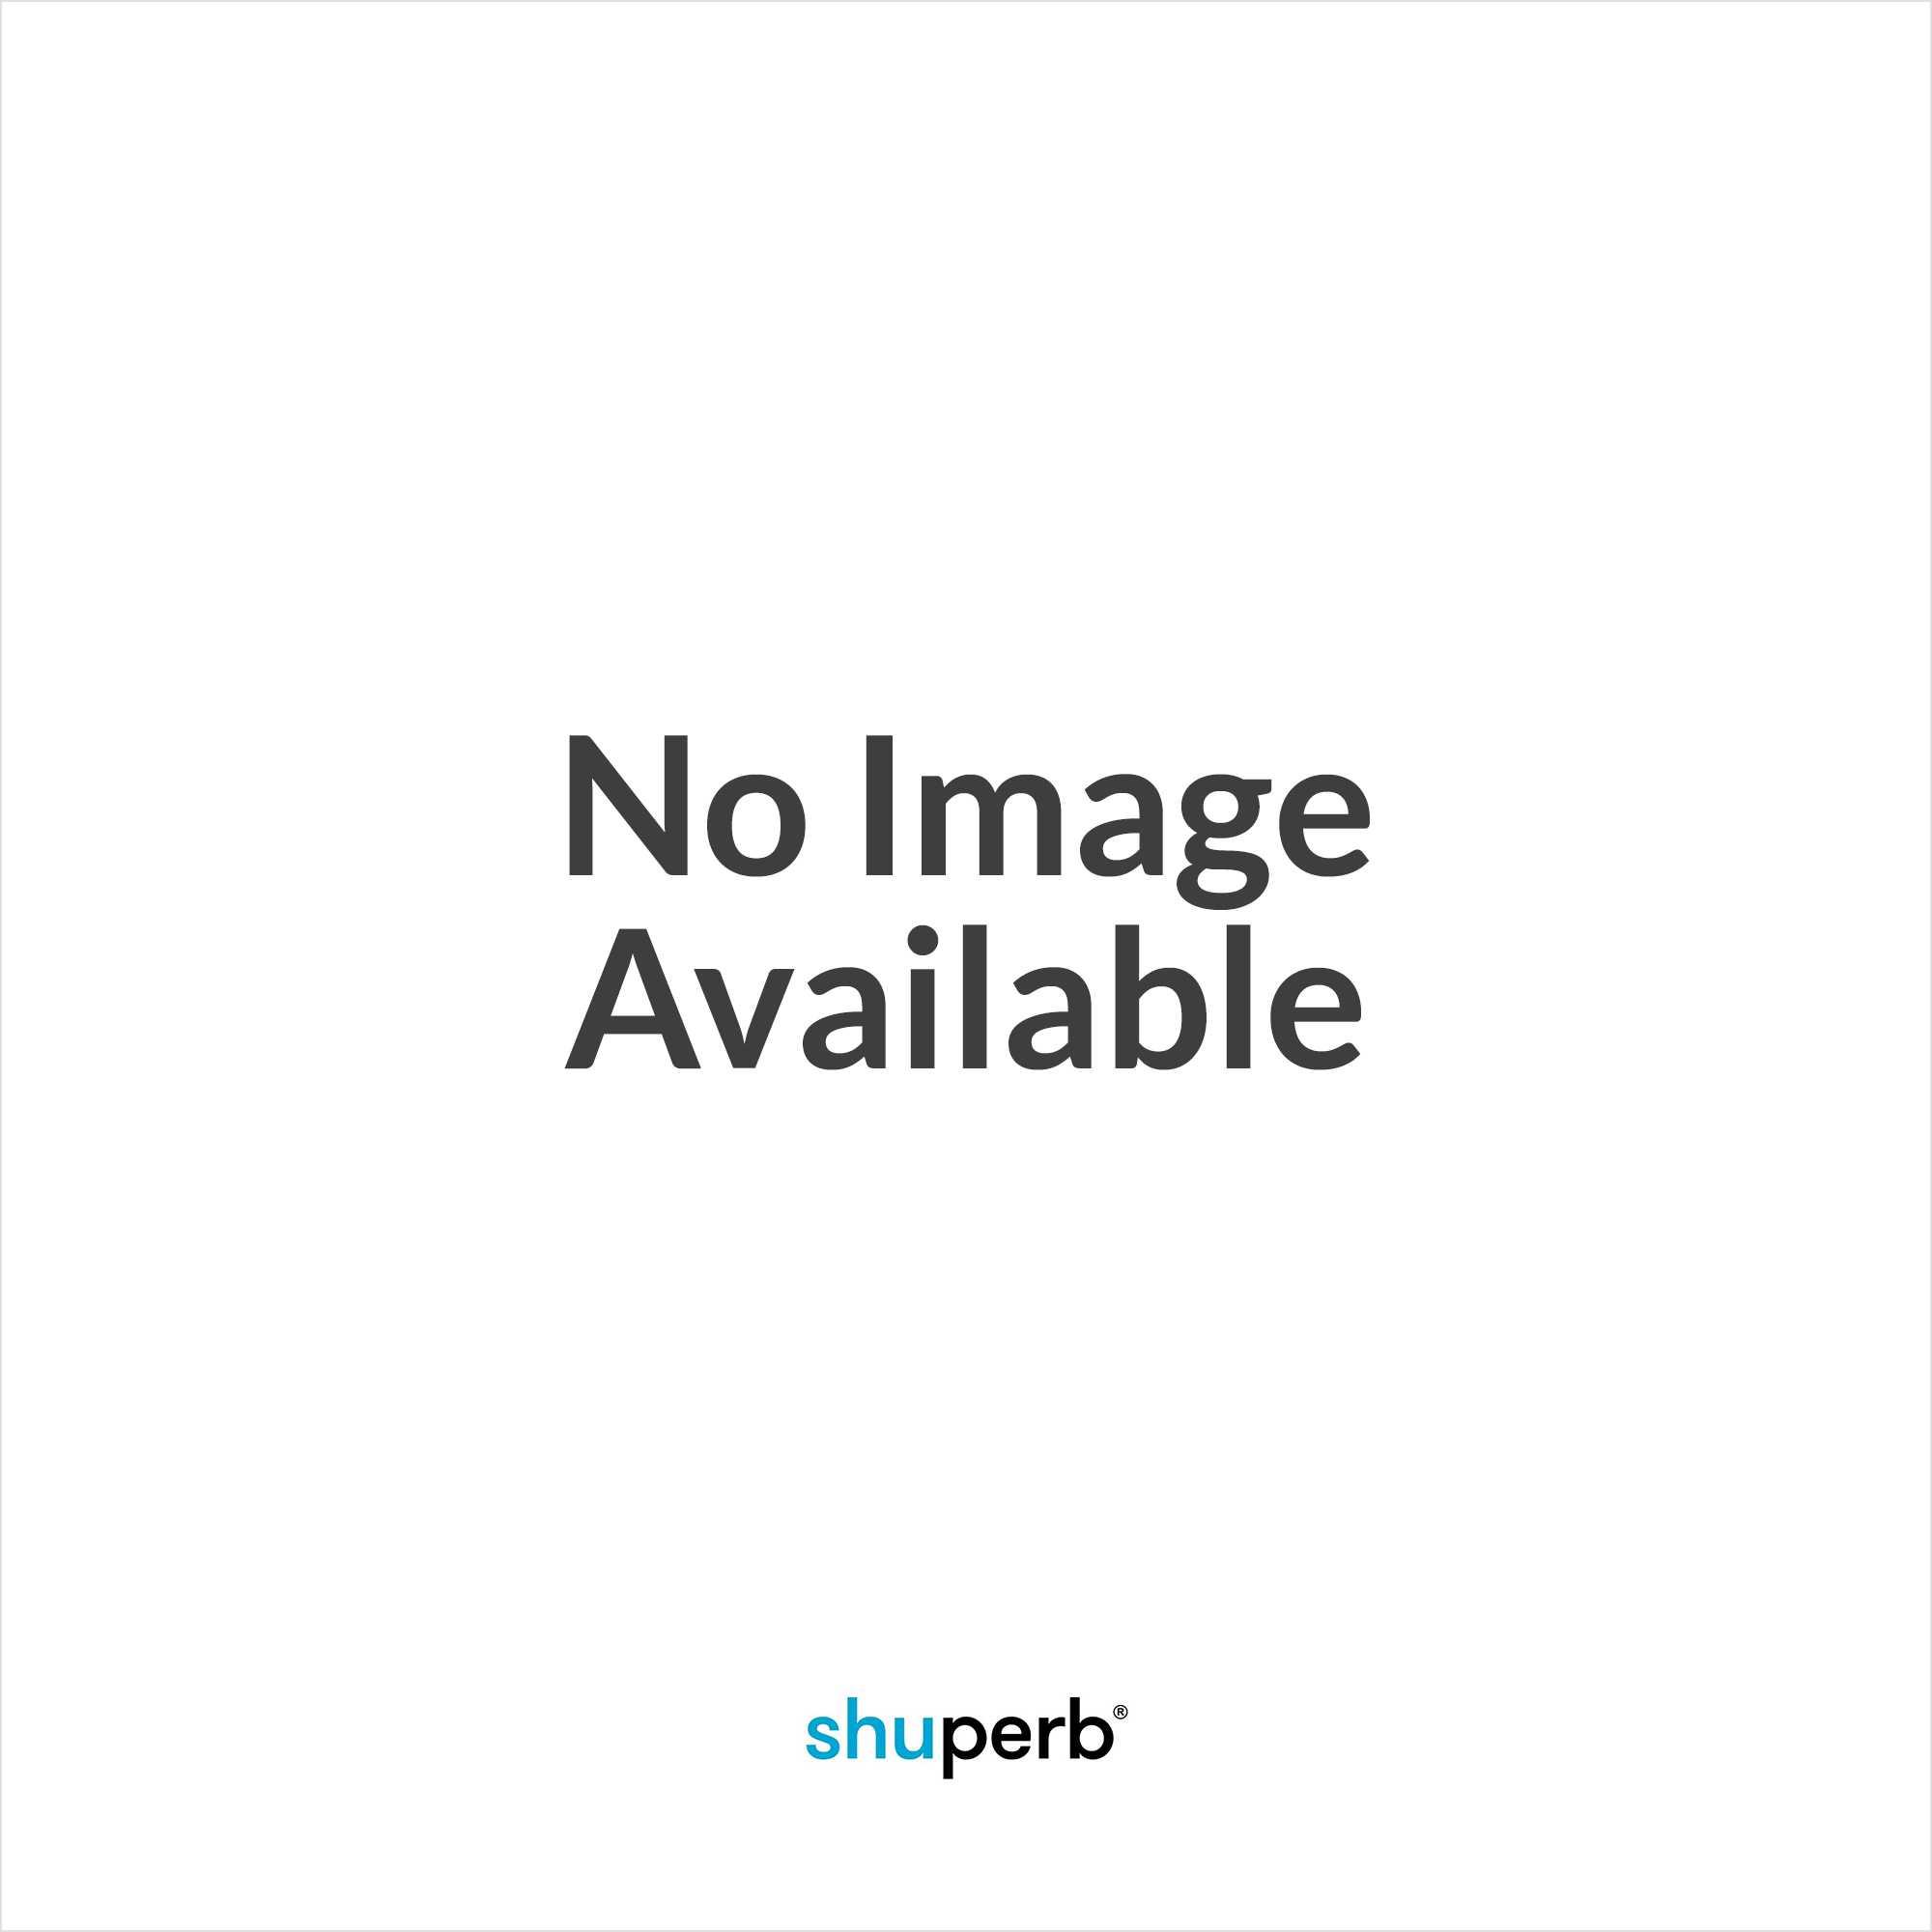 f1aa808f4e5 UGG SCUFFETTE II Ladies Mule Slippers Black/Grey